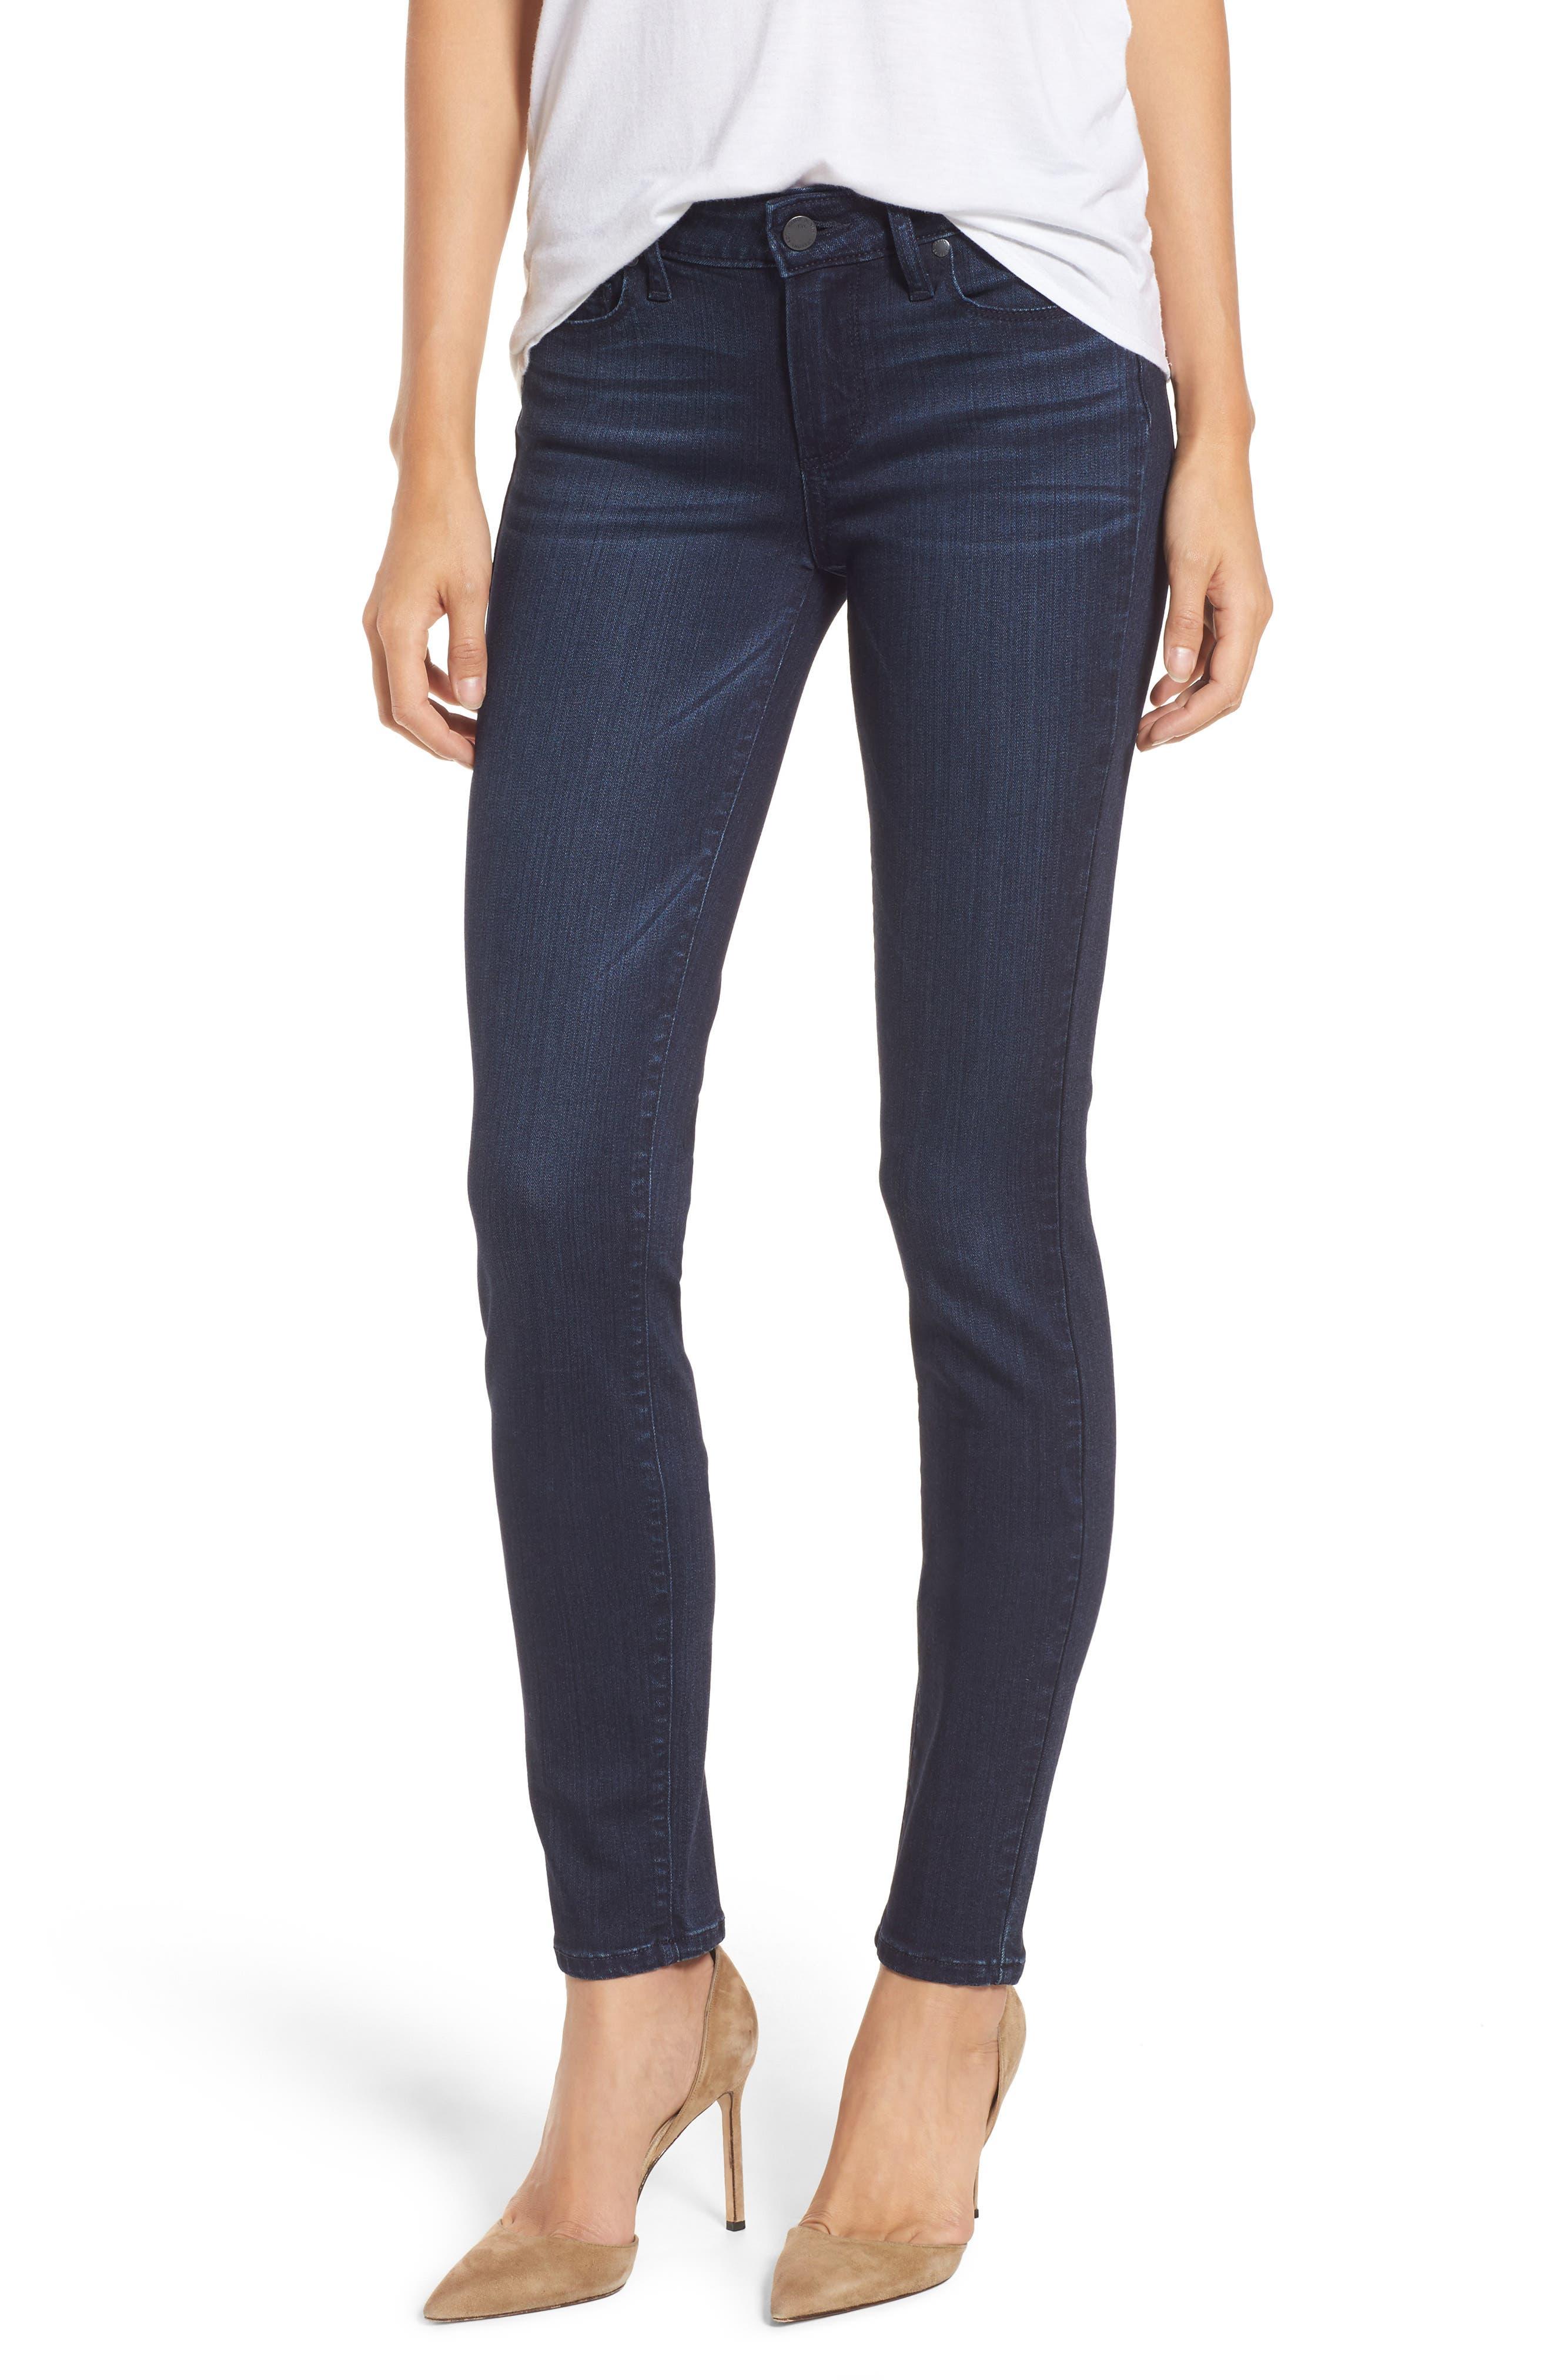 Main Image - PAIGE Transcend - Verdugo Ultra Skinny Jeans (Hazen)